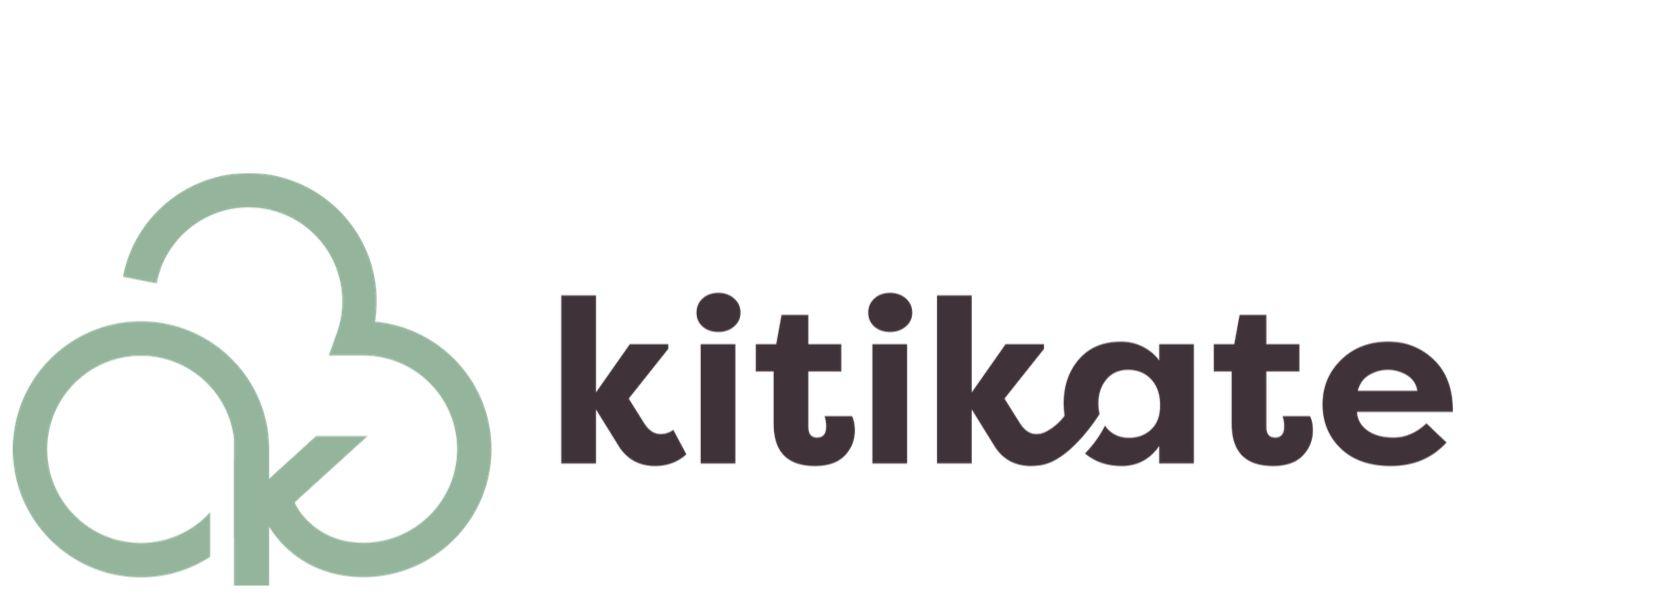 O Kitikate